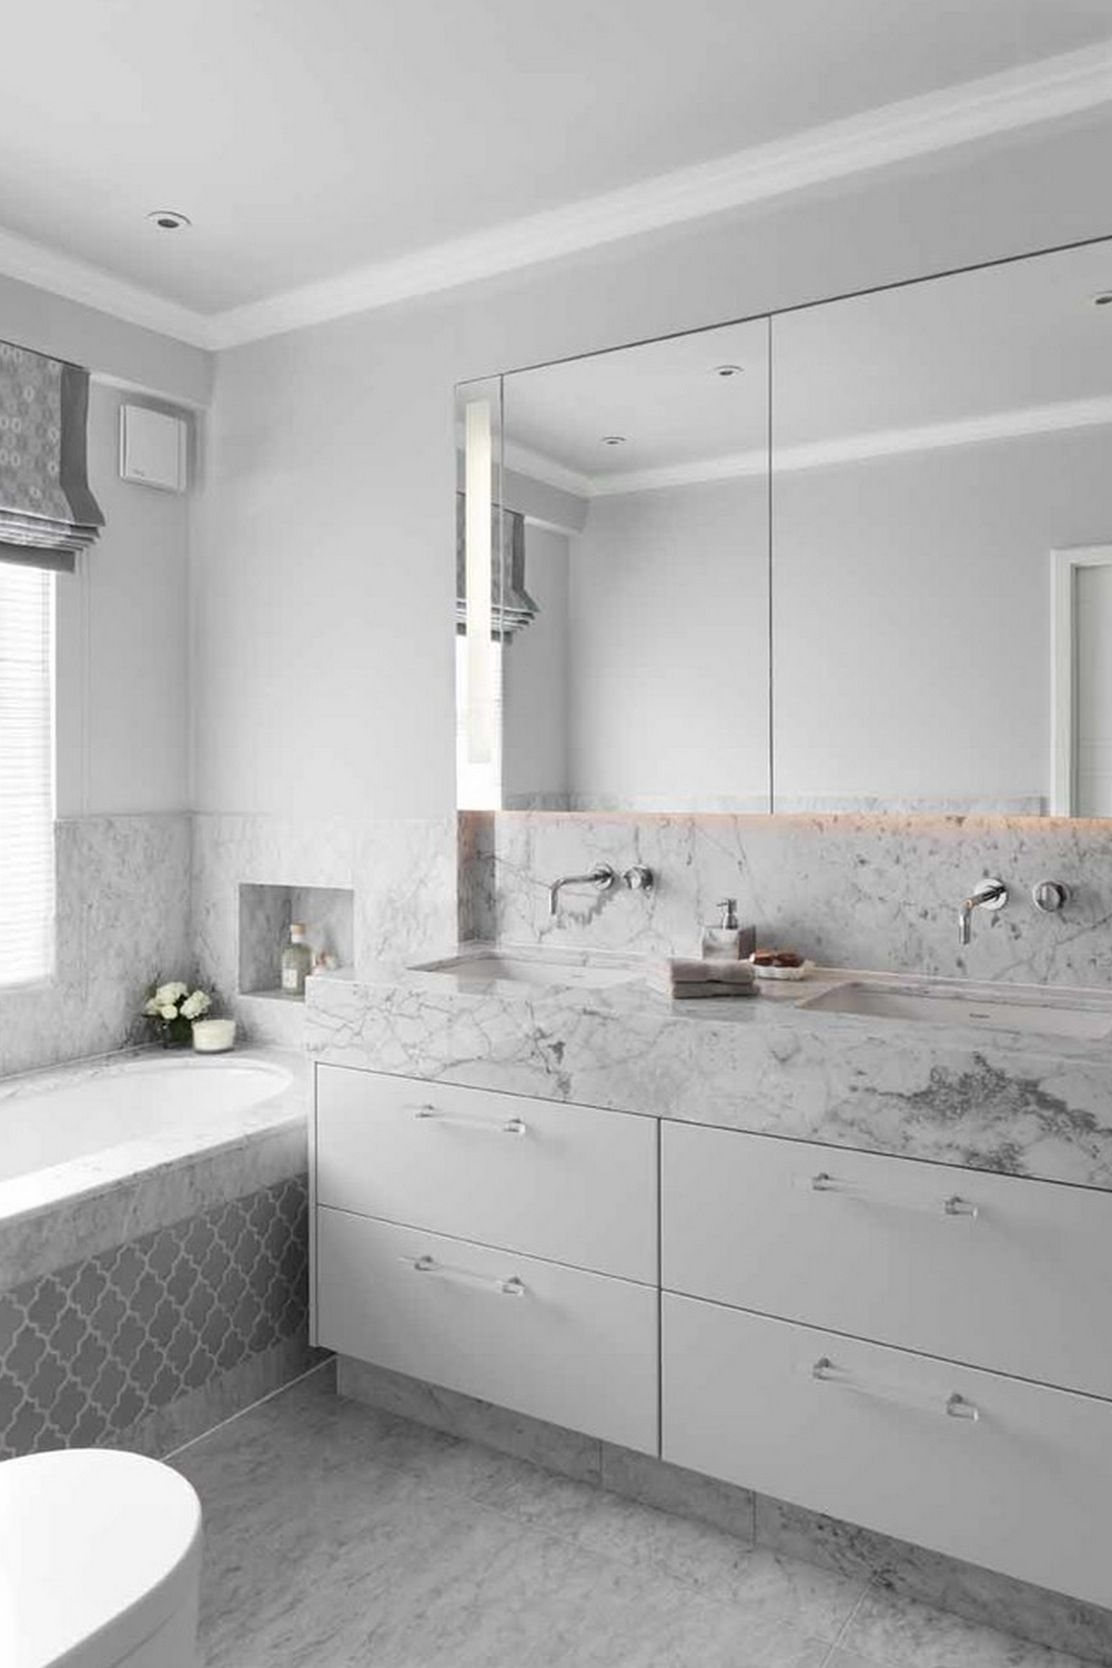 Bathroom Design July 2014 53   Bathroom   Pinterest   Bathroom ...